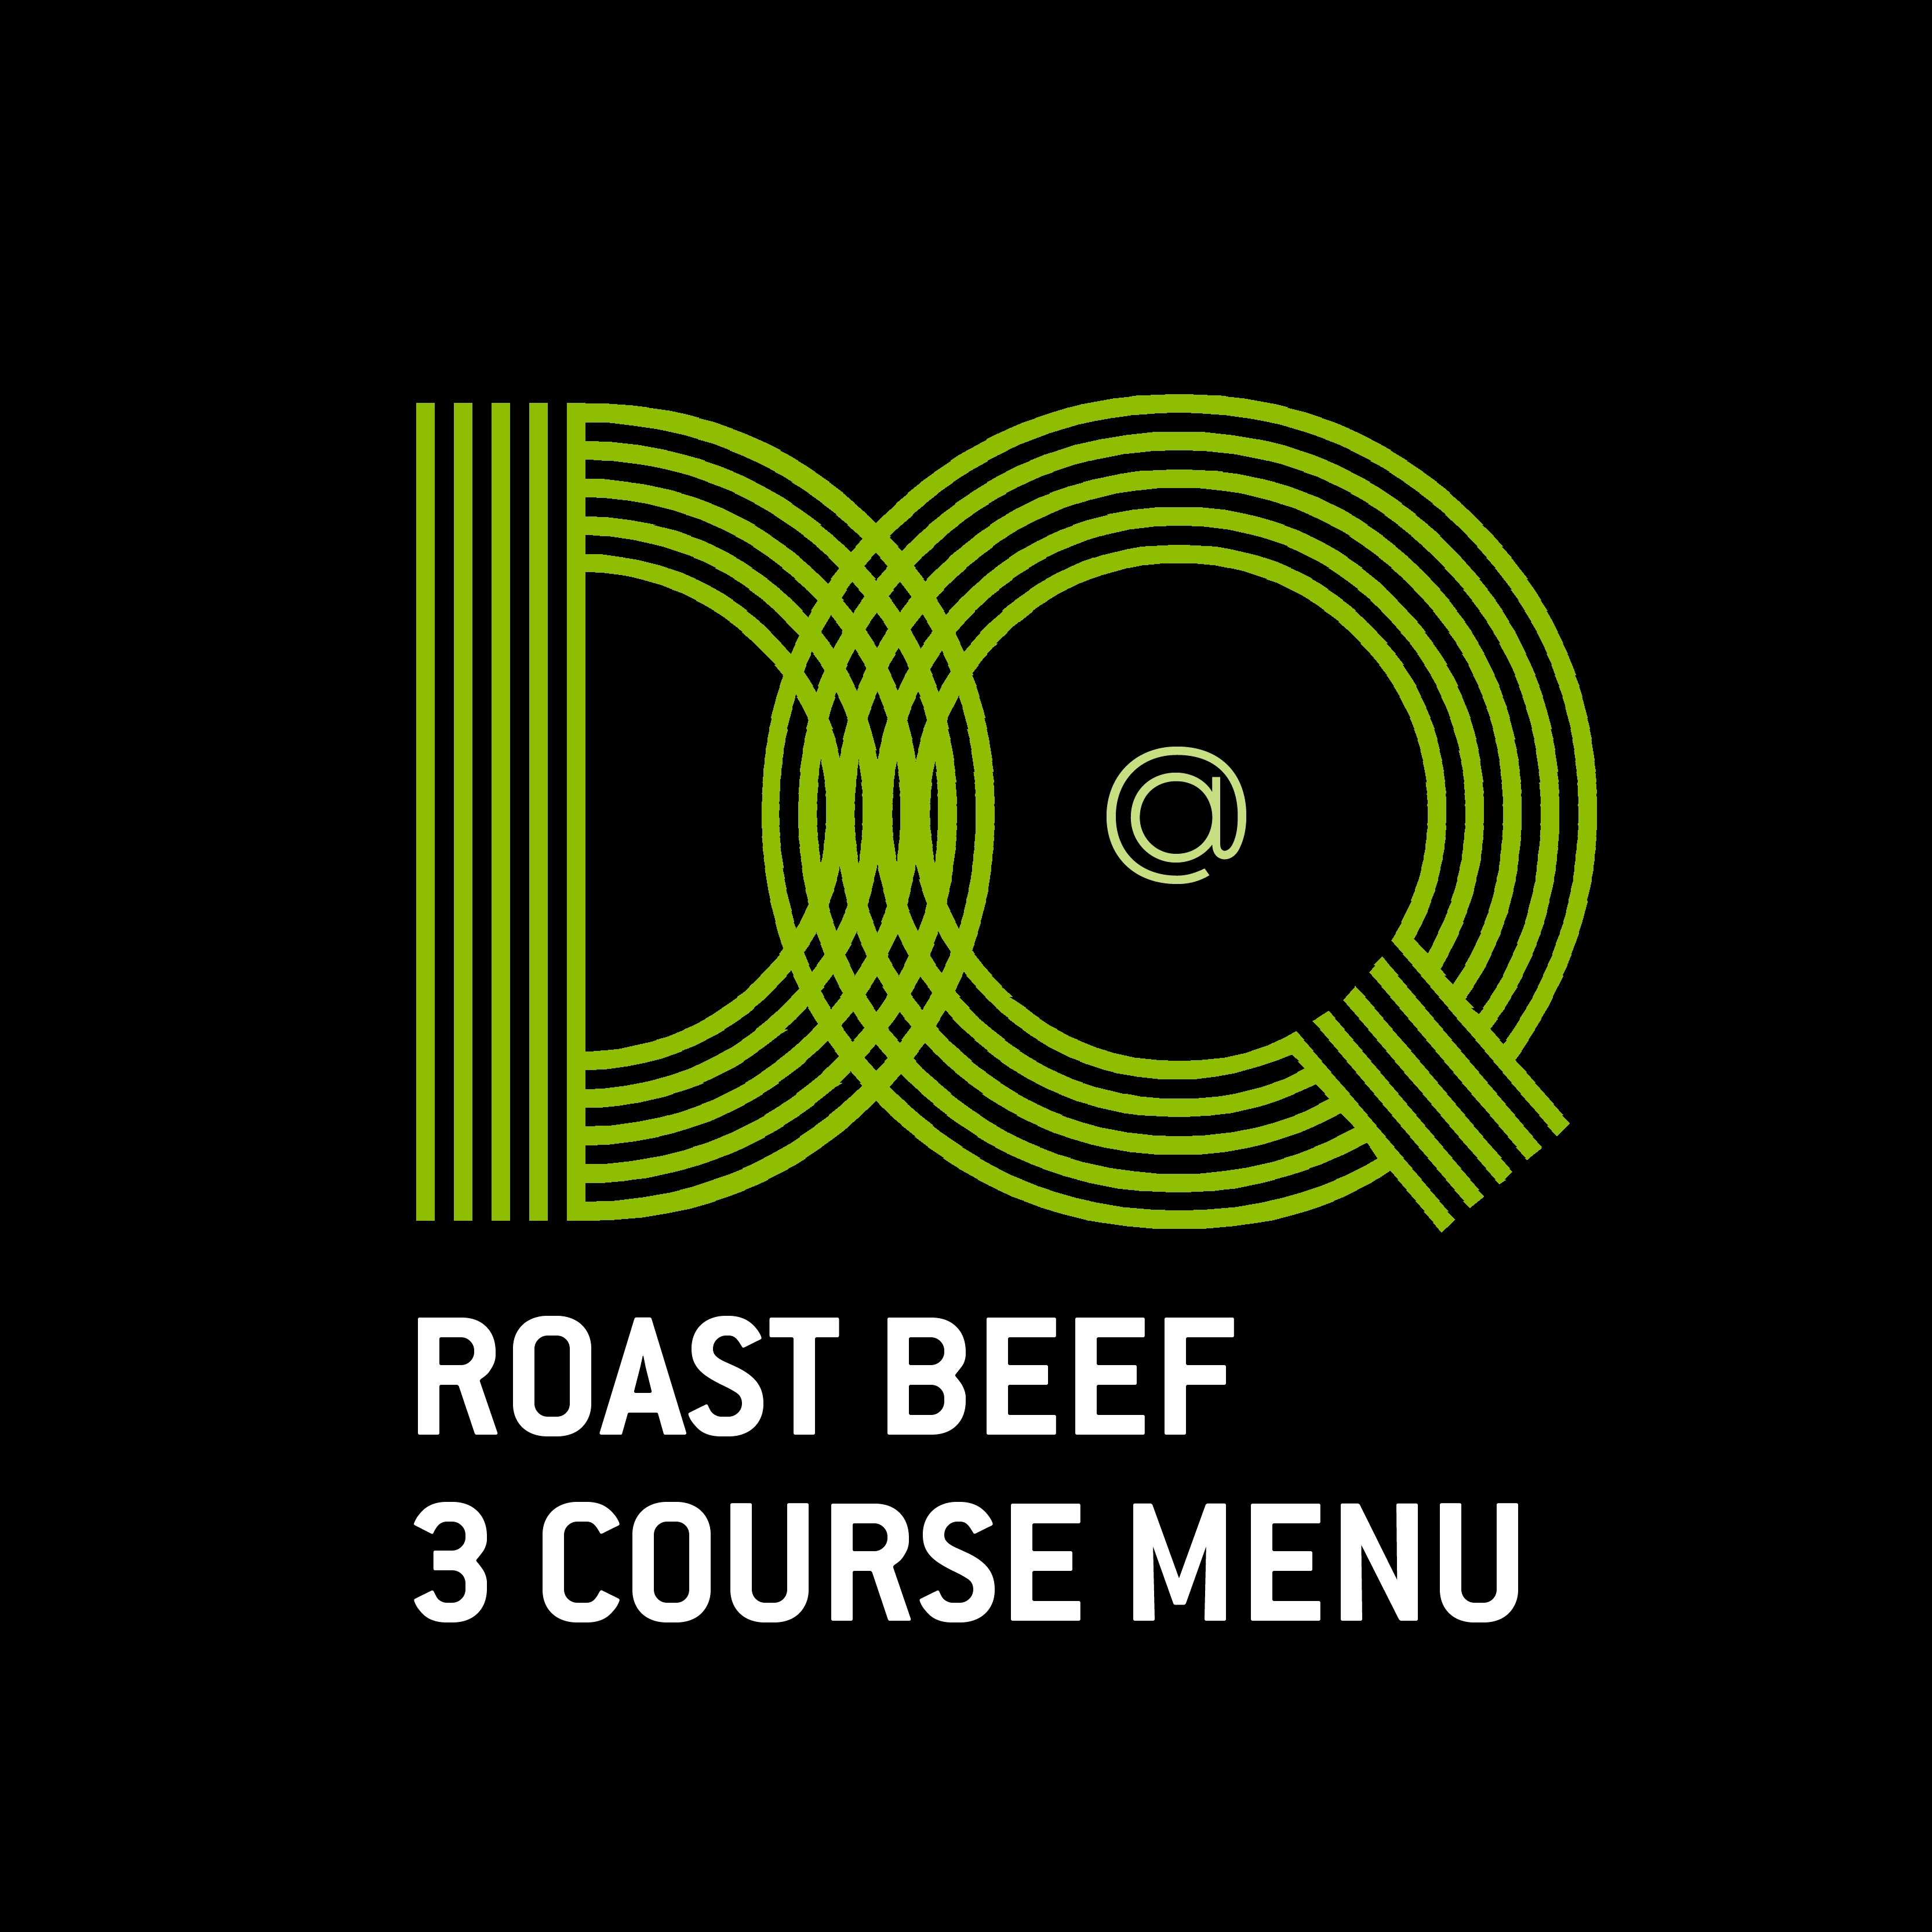 19. DQ - SUNDAY ROAST BEEF 3 COURSE MENU